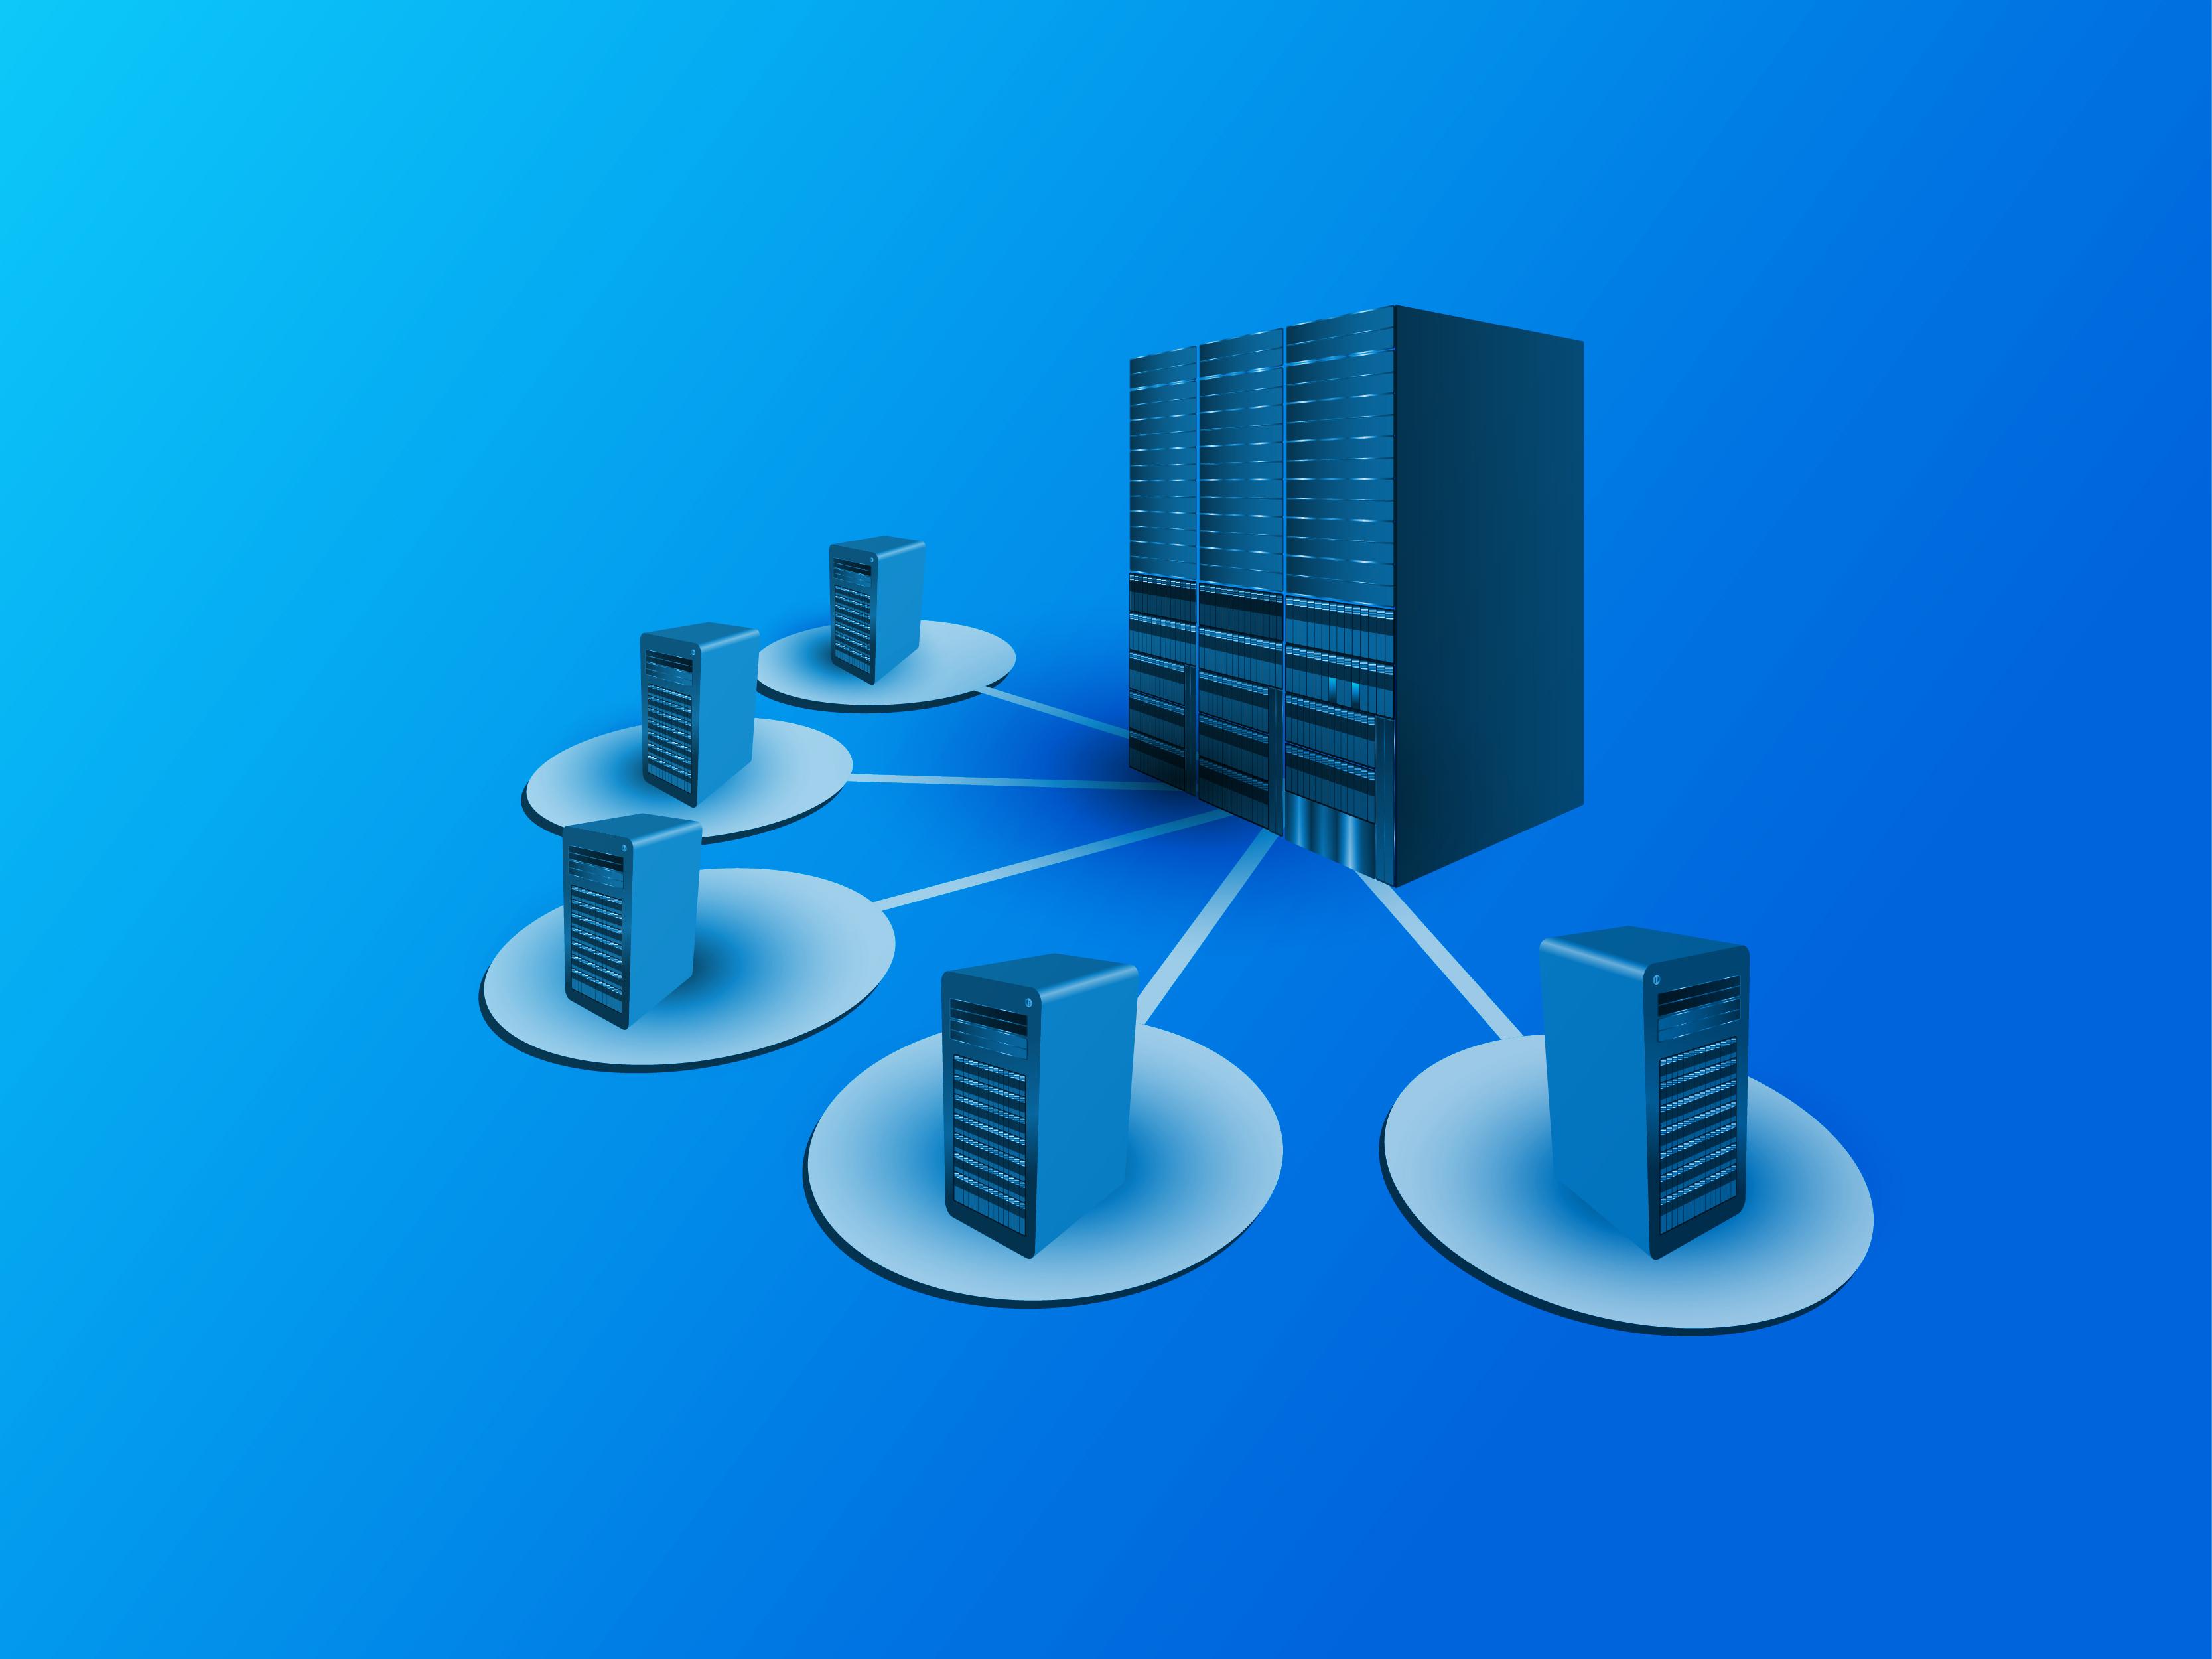 Better NetScaler GSLB proximity with EDNS Client Subnet (ECS)